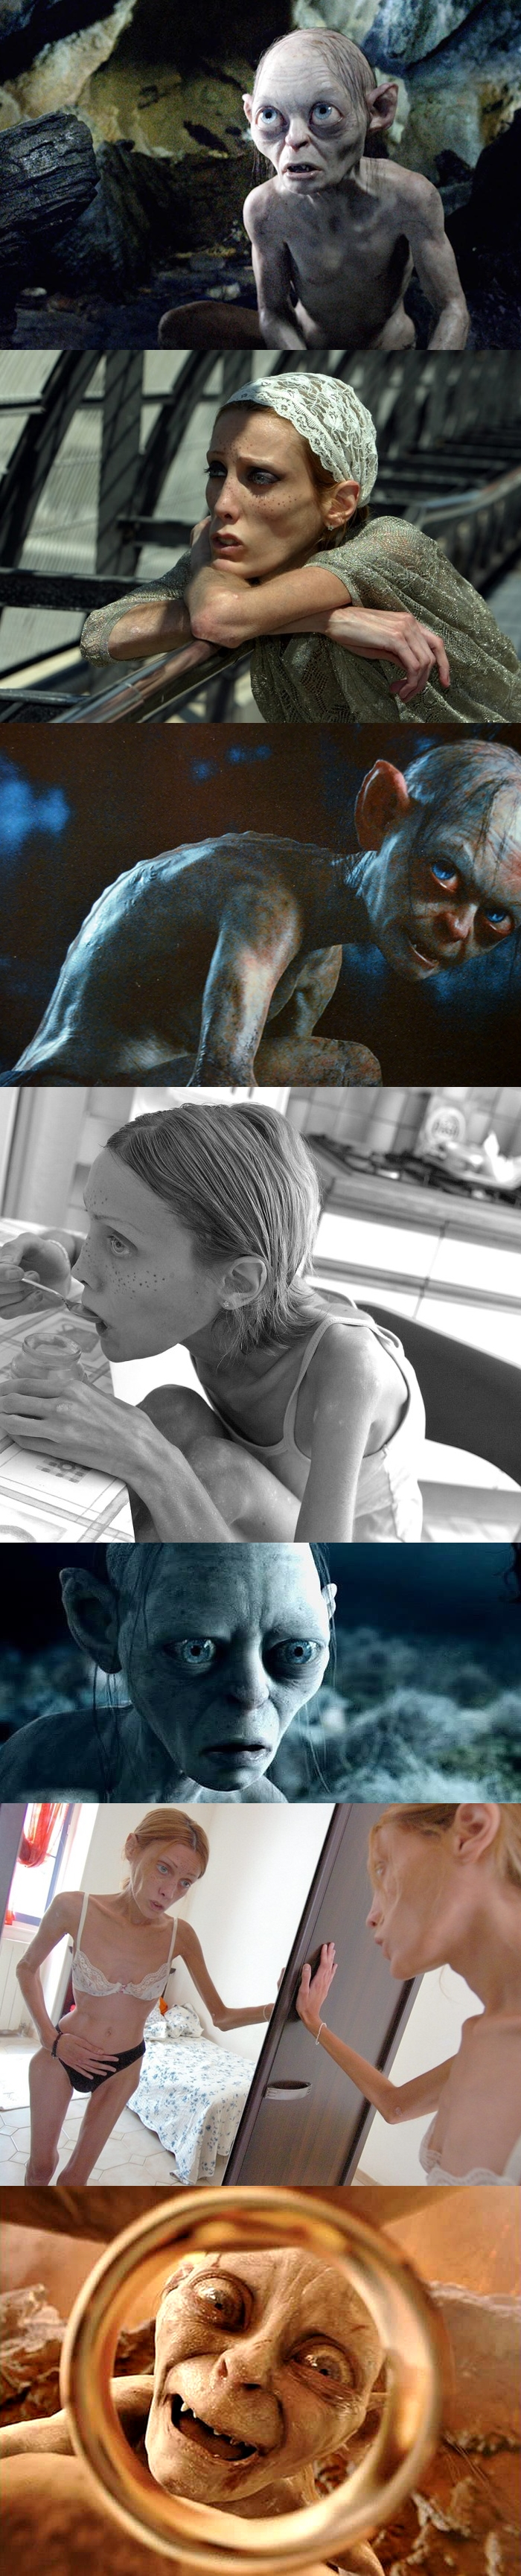 isabelle caro gollum lotr anorexia